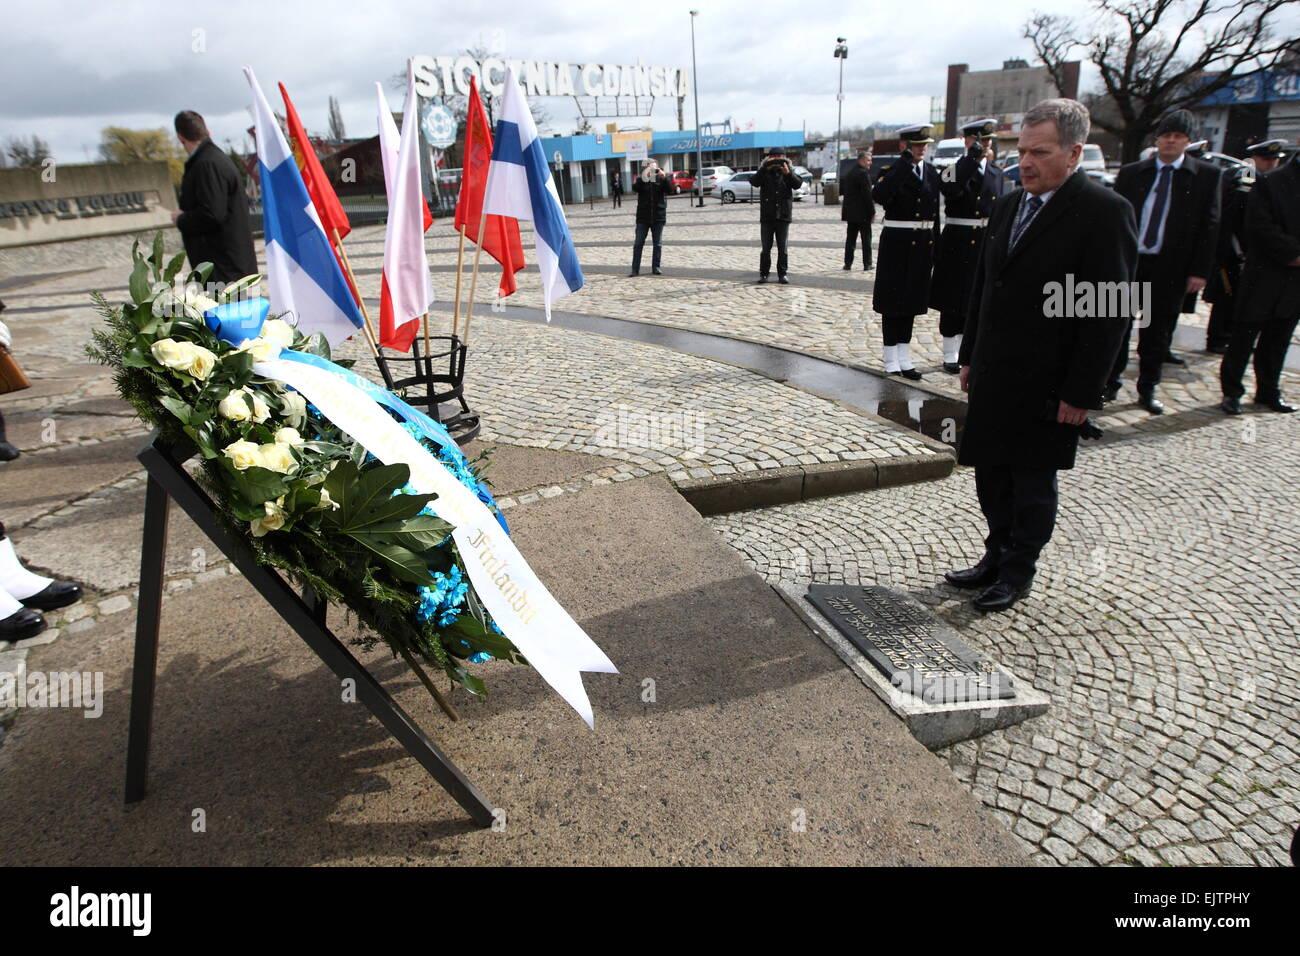 Gdans, Poland 1st, April 2015 President of FinlandSauli Niinisto visit to Gdansk. Sauli Niinisto laid flowers under - Stock Image